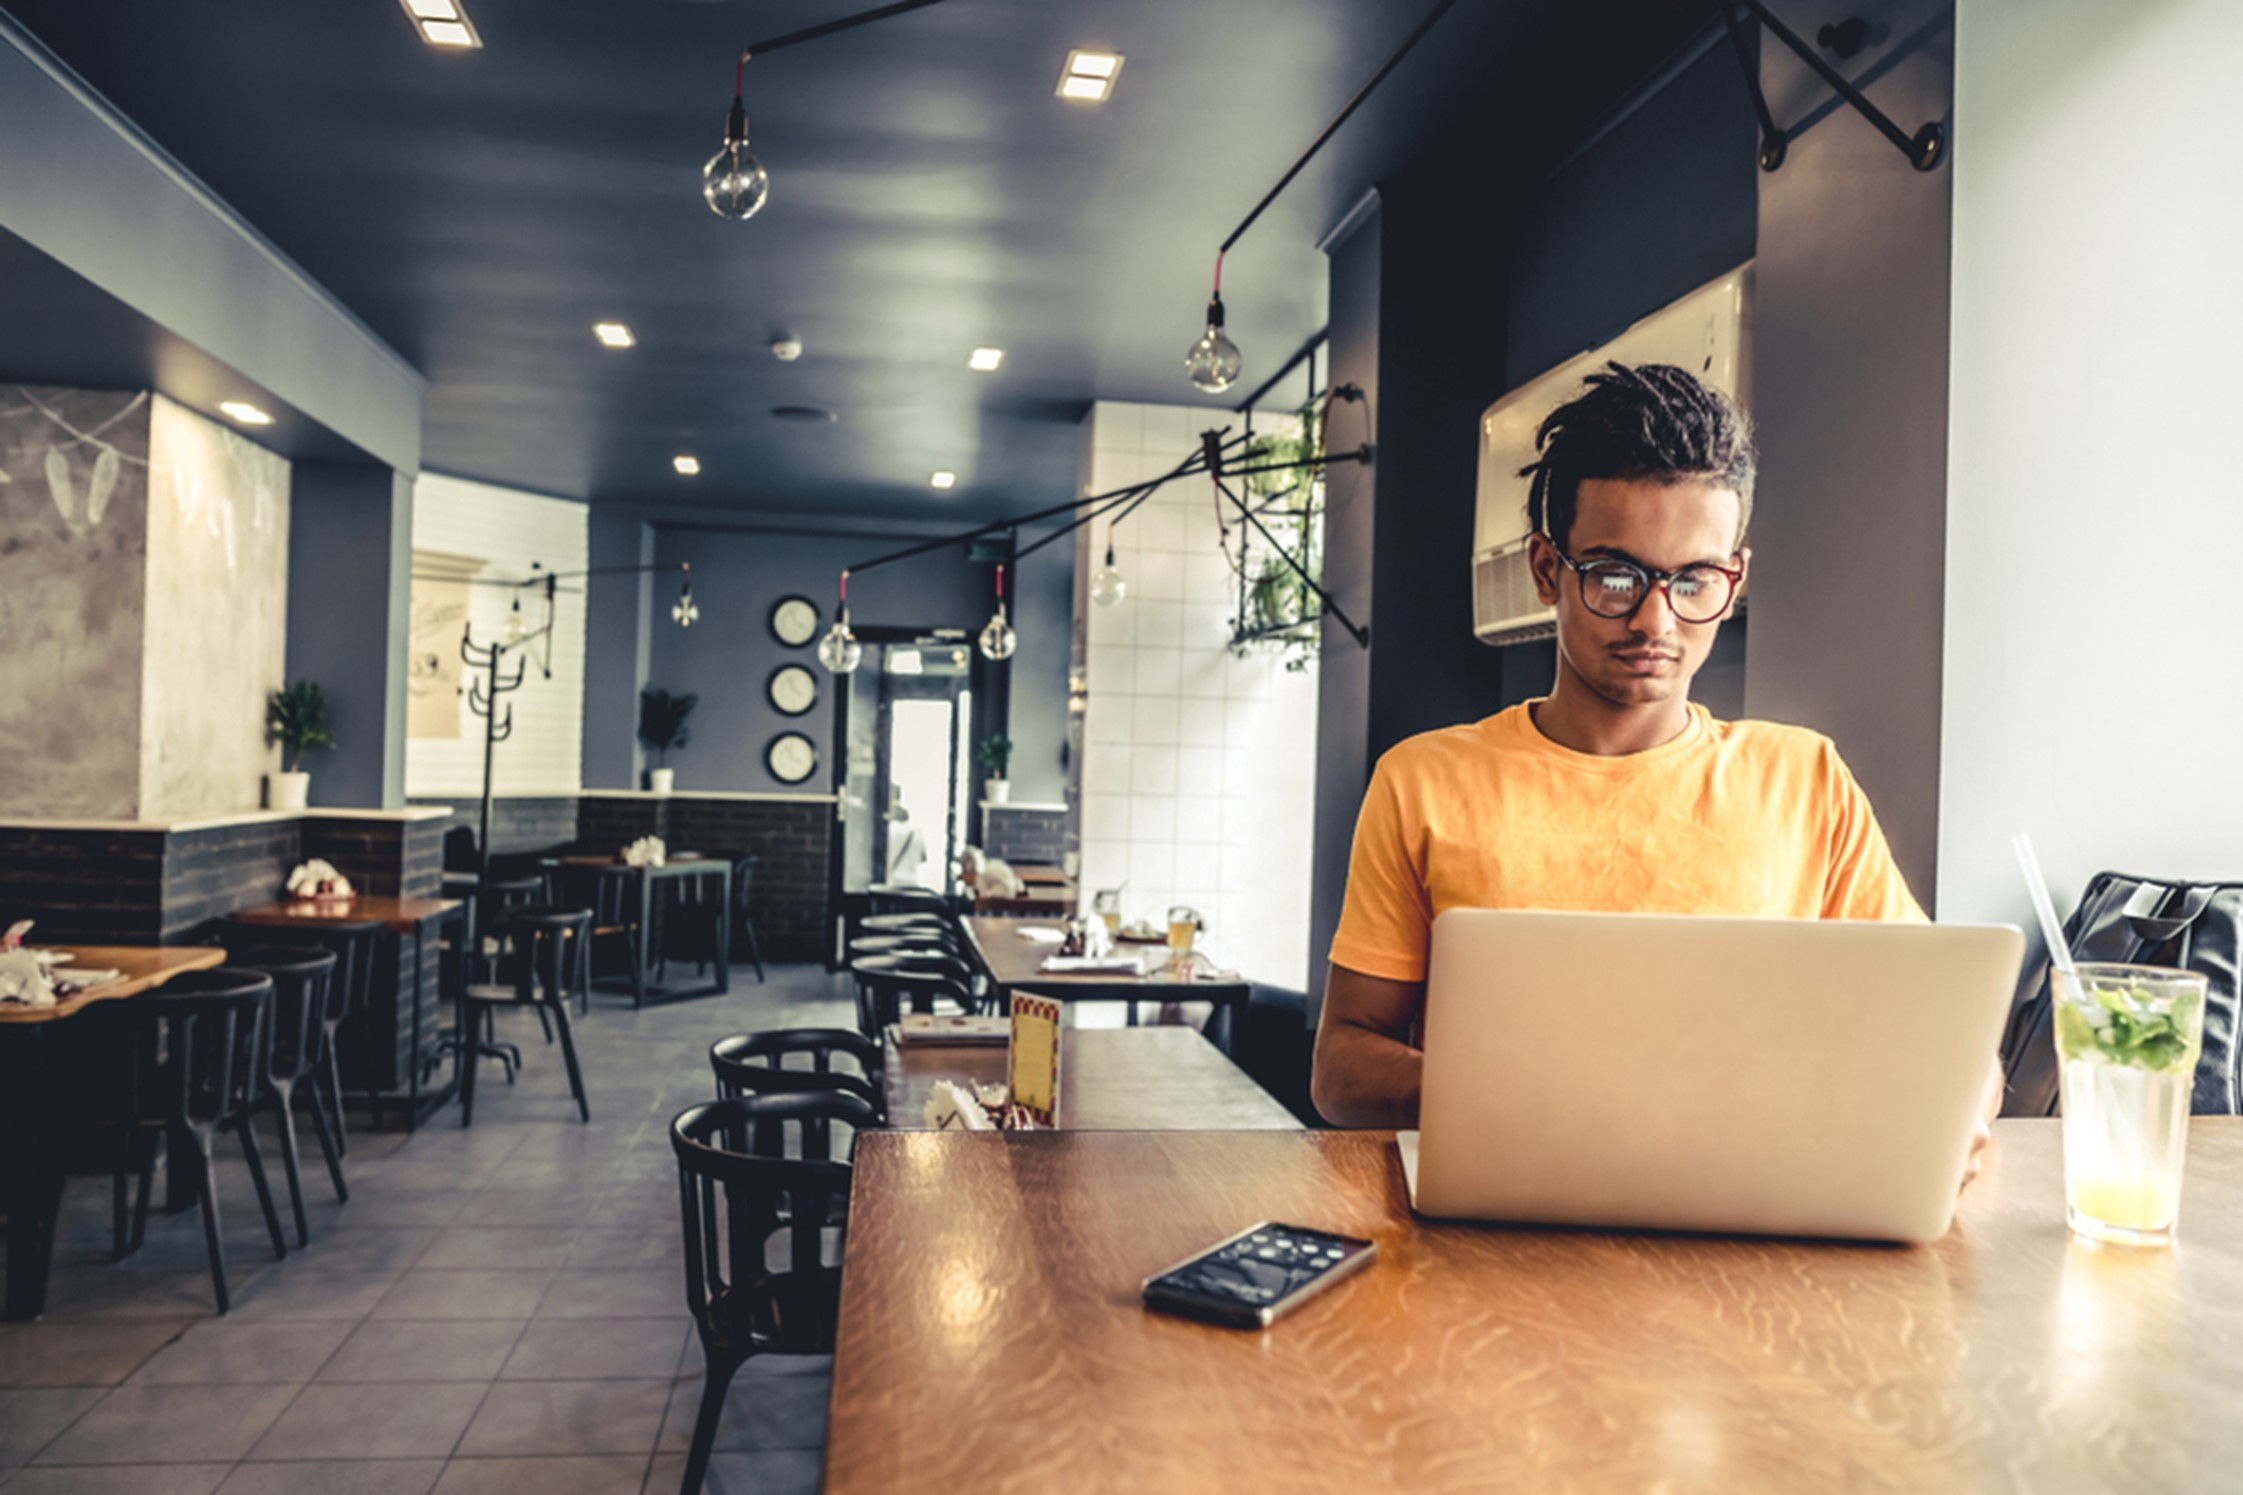 5 Tips for Starting Your Freelance Career